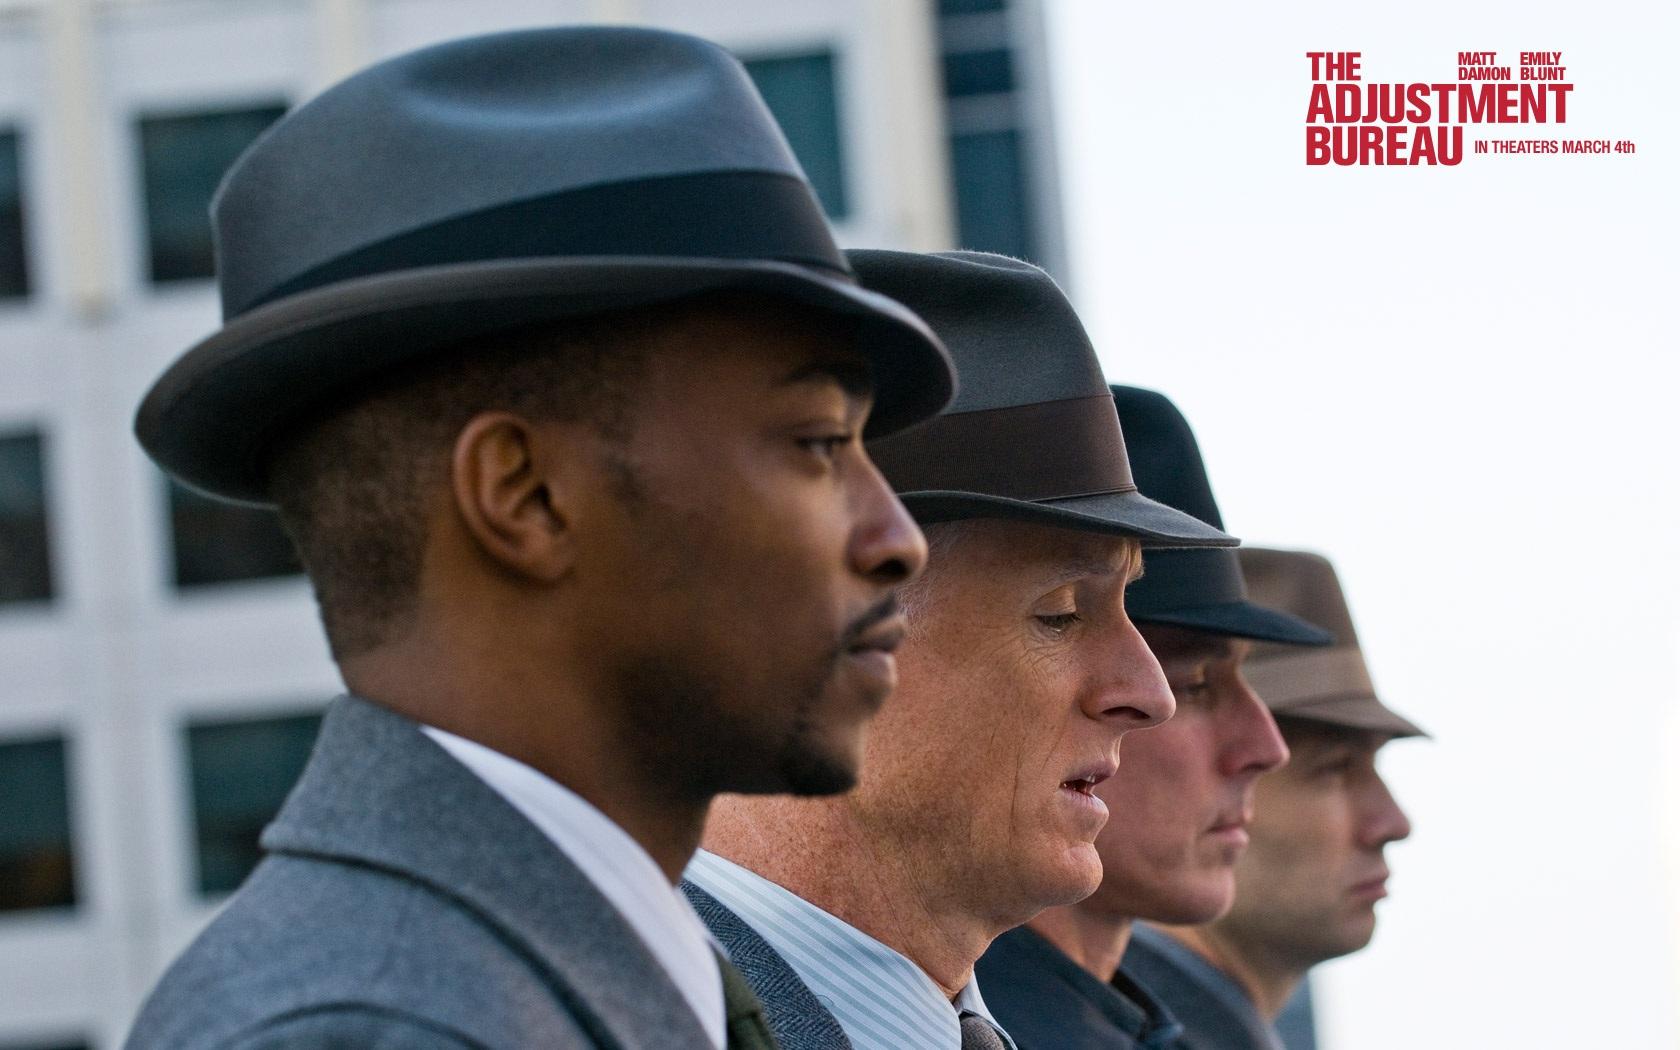 The Adjustment Bureau (US 2011) | The Case for Global Film